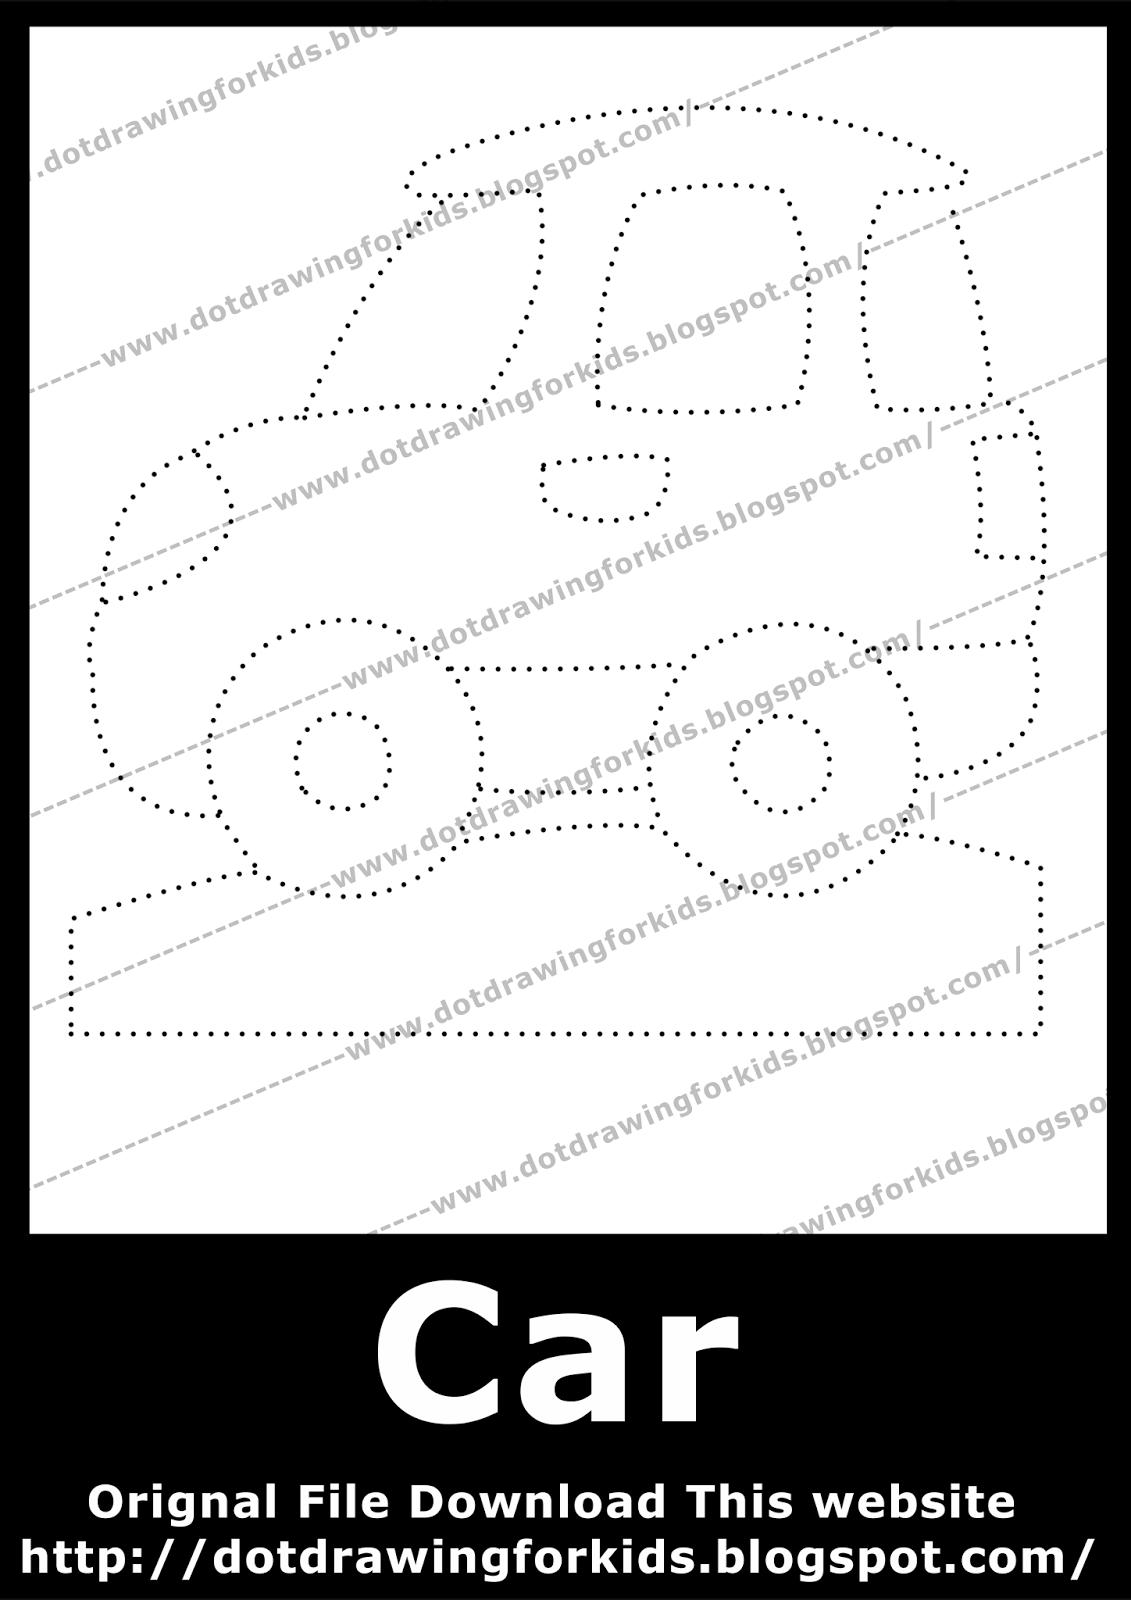 1131x1600 dot drawing for kids car dot drawing for kids, dot to dot